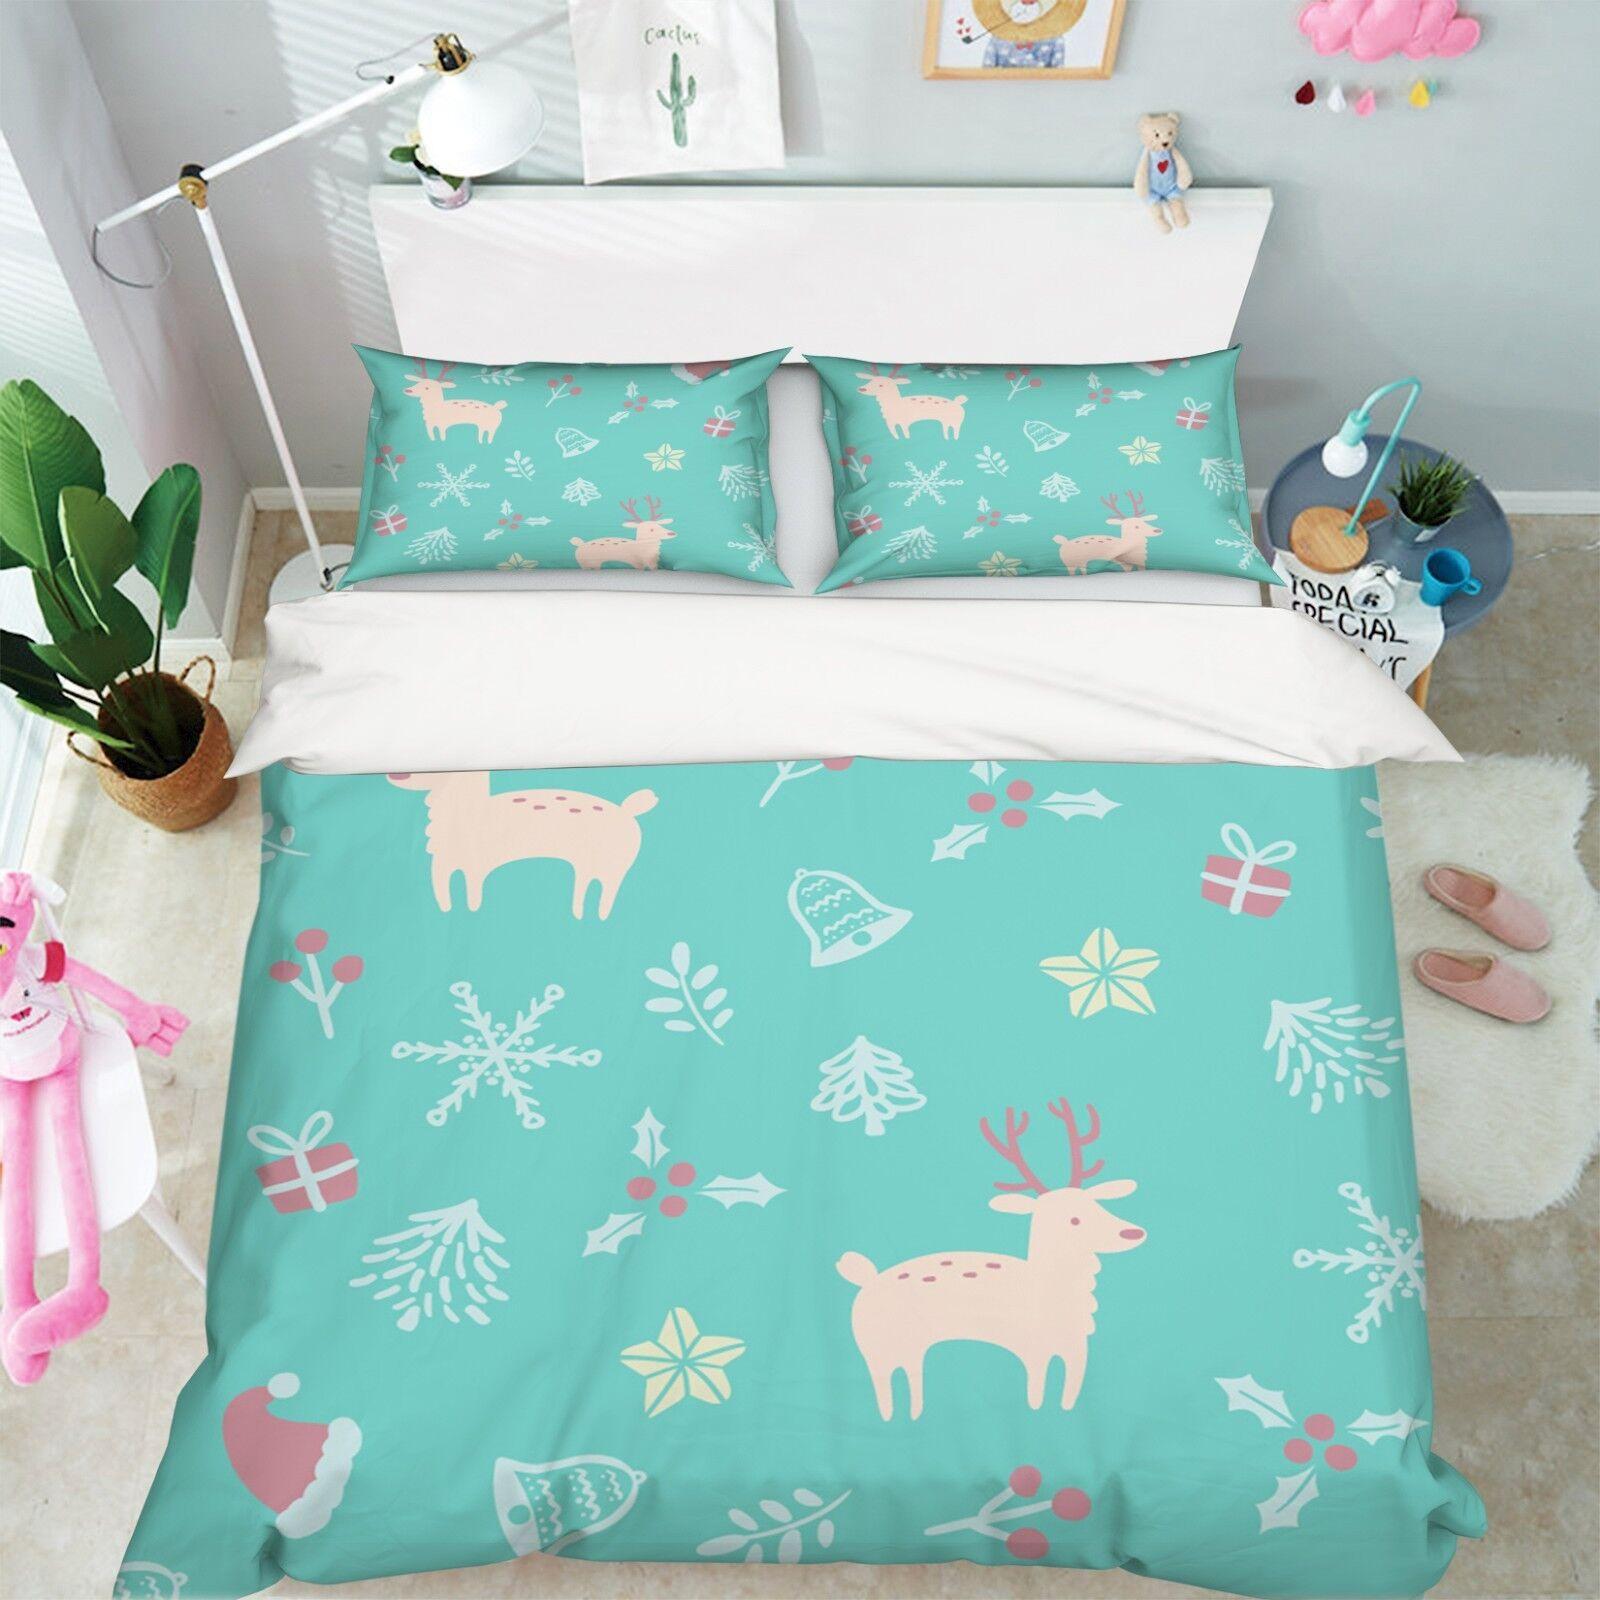 3D Christmas Xmas 516 Bed Pillowcases Quilt Duvet Cover Set Single Queen King AU